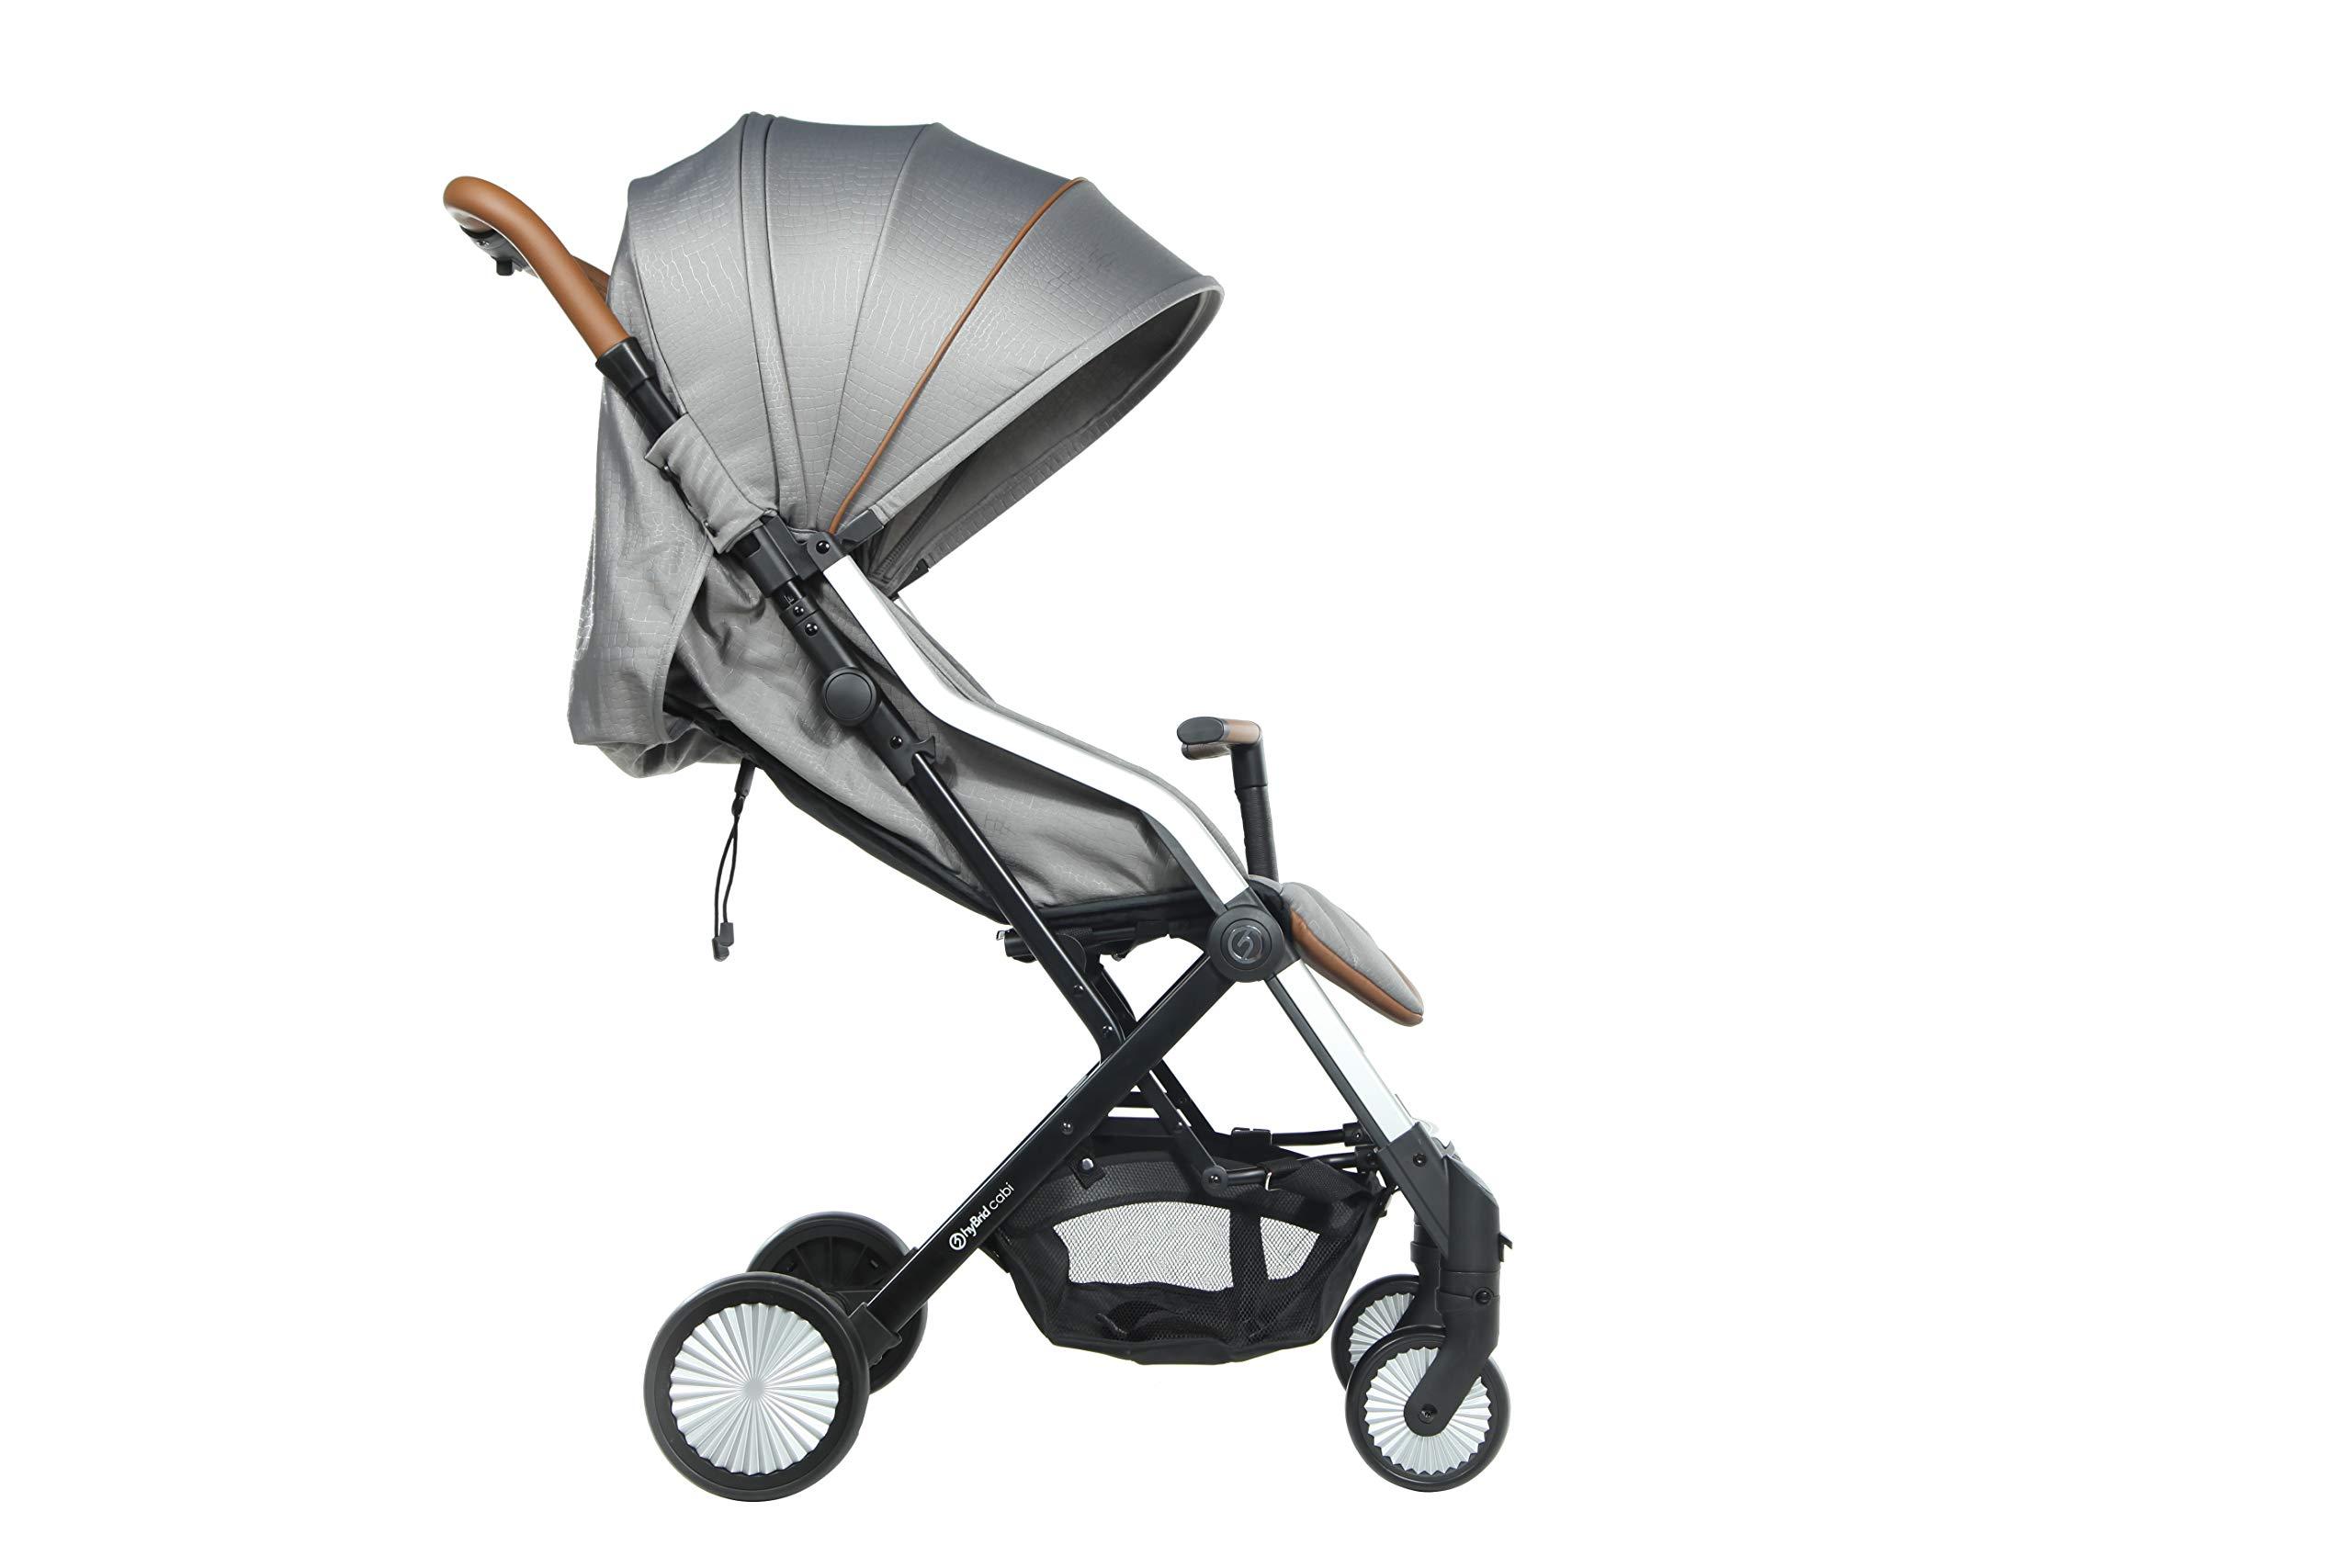 Hybrid CABI Stroller, Stone Oyster Lie-flat recline and ventilation window Cabin fold design Adjustable canopy and footrest 4